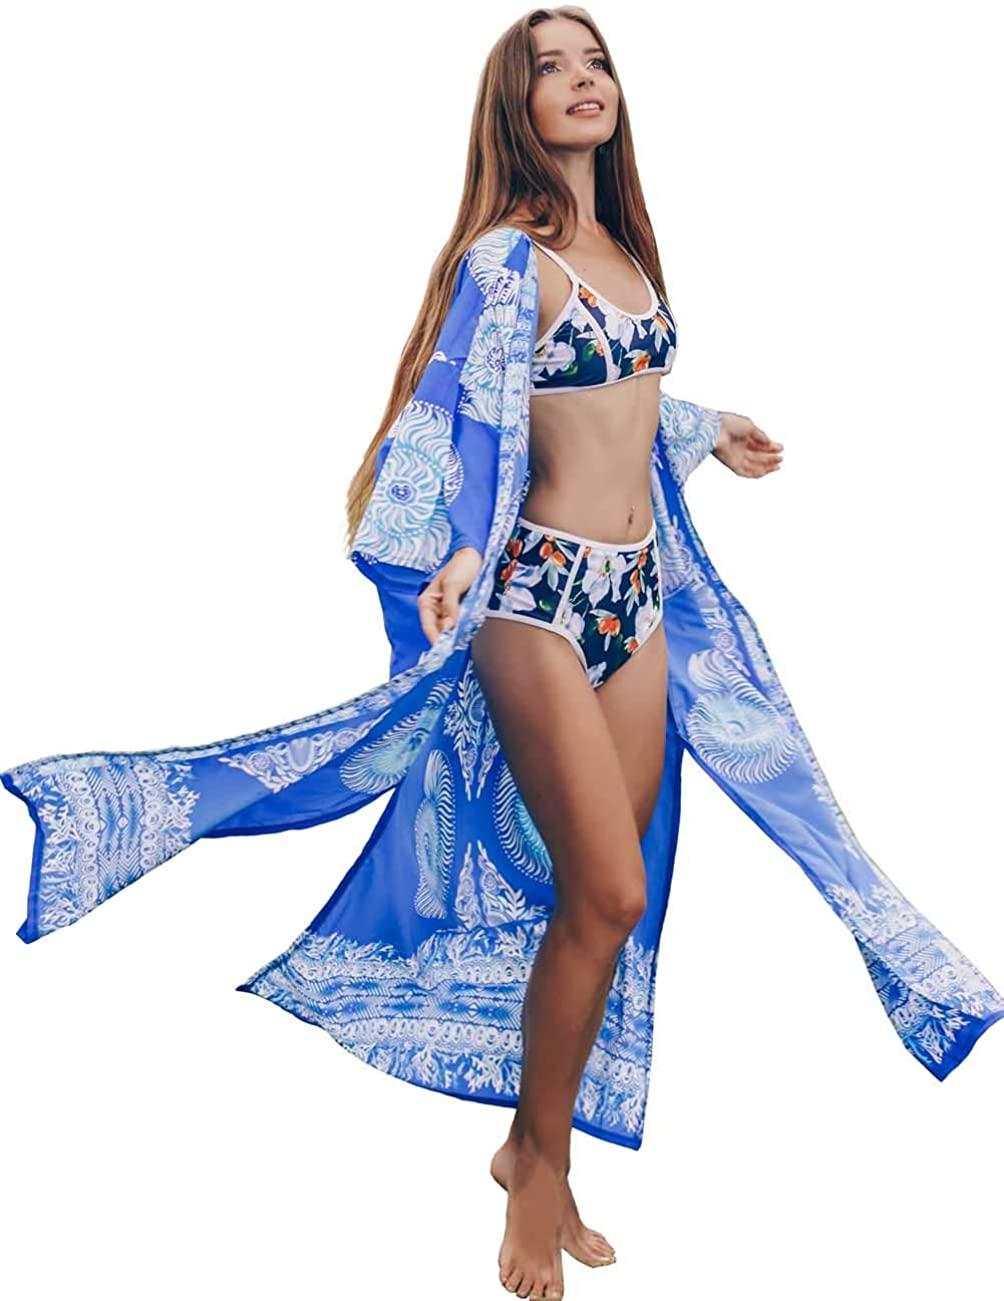 Women's Beach Cover Ups Cardigan Open Front Half Sleeve Long Bikini Kimono Quick-Drying Floral Printed Blue (287)